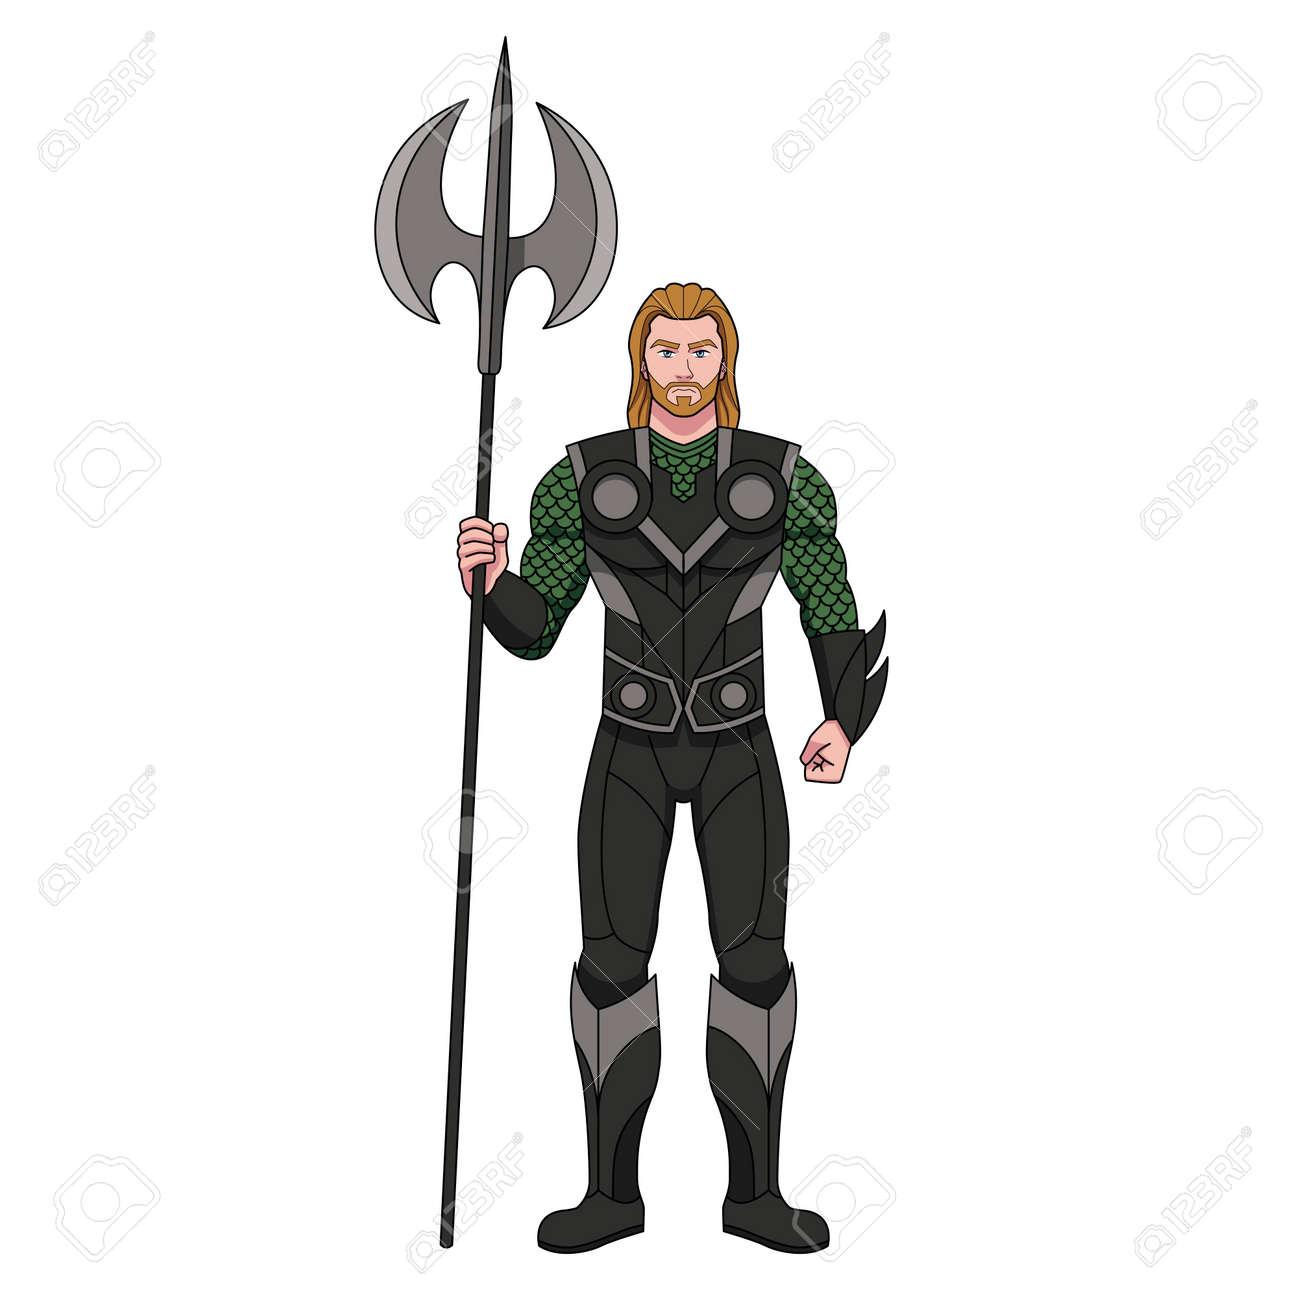 Isolated cartoon of a superhero - Vector illustration - 164693156